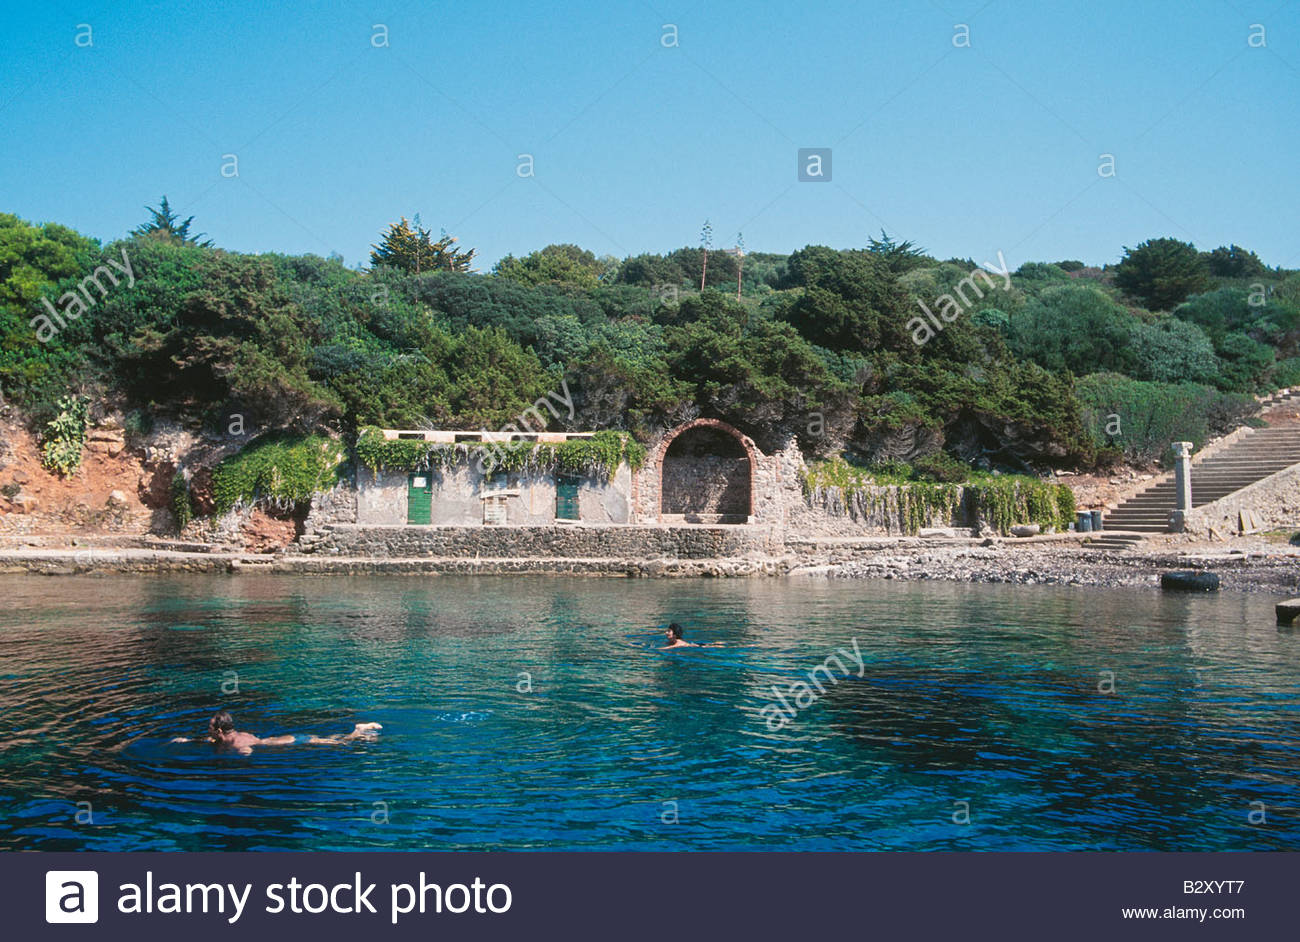 Giannutri Island